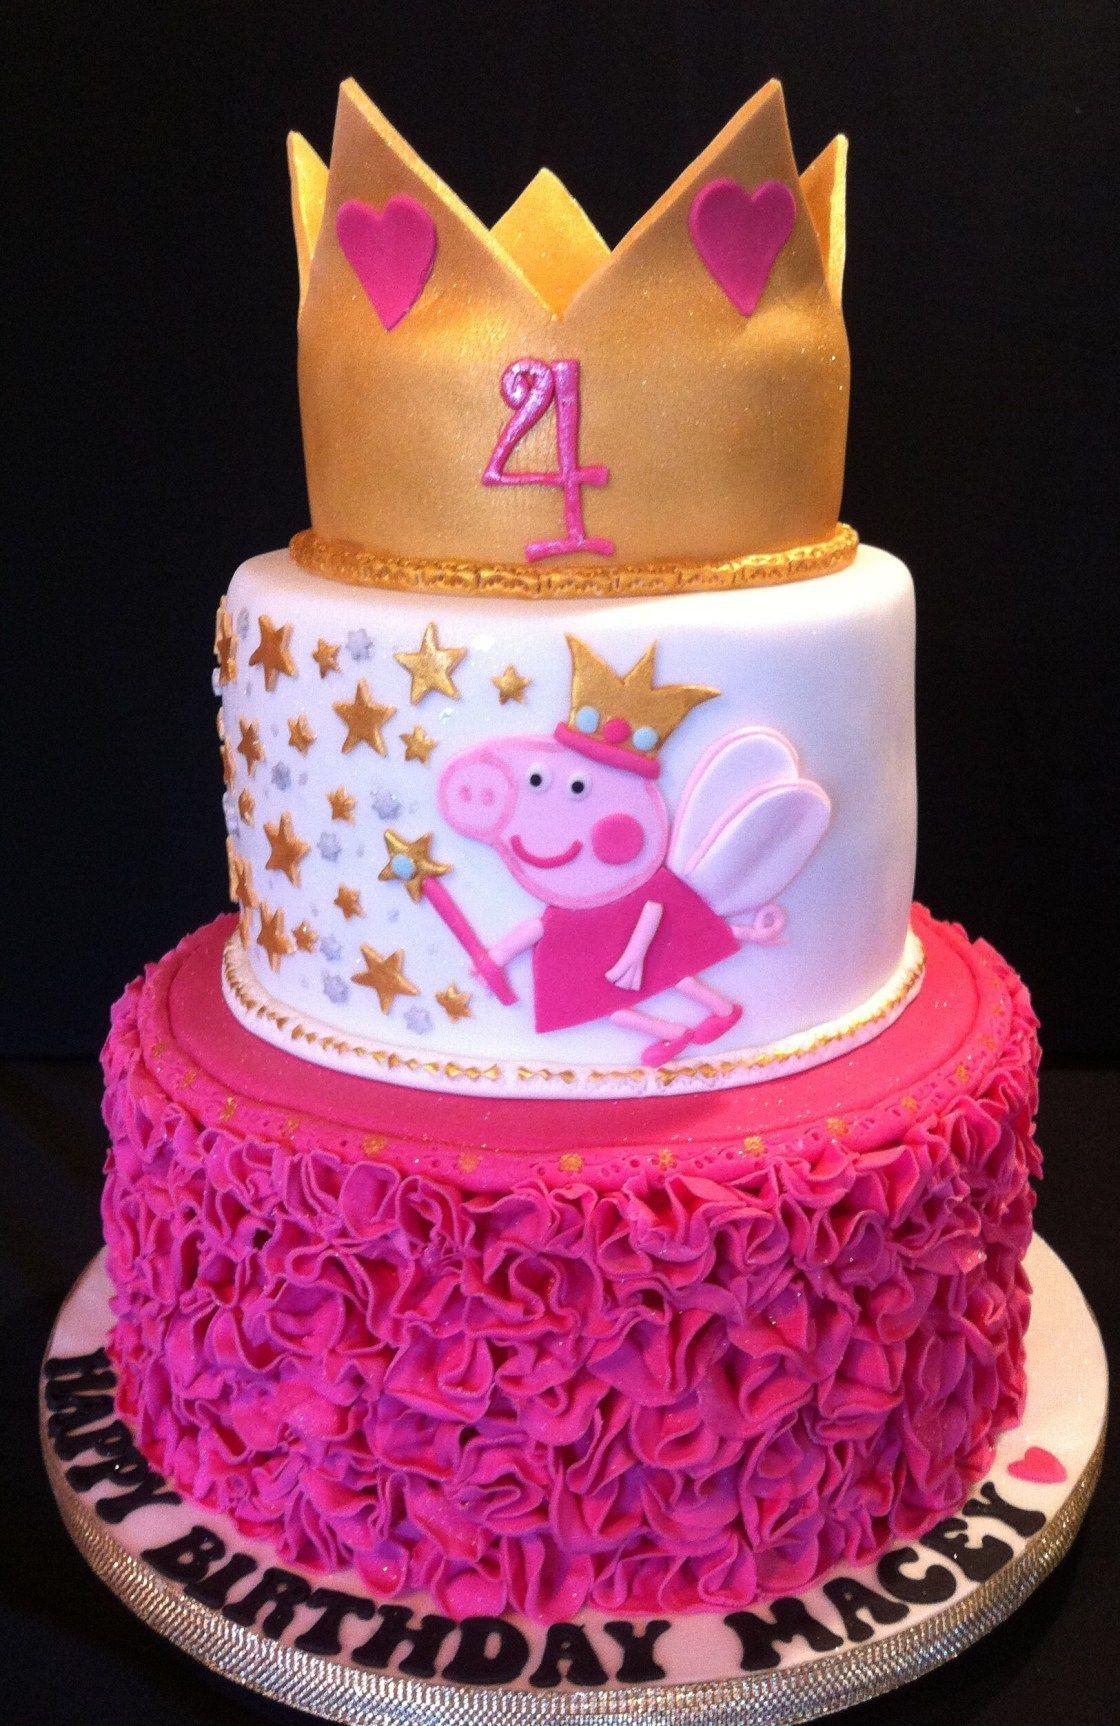 Cool Peppa Pig Geburtstagstorte Peppa Pig Prinzessinstorte Brelynn 4 Personalised Birthday Cards Bromeletsinfo